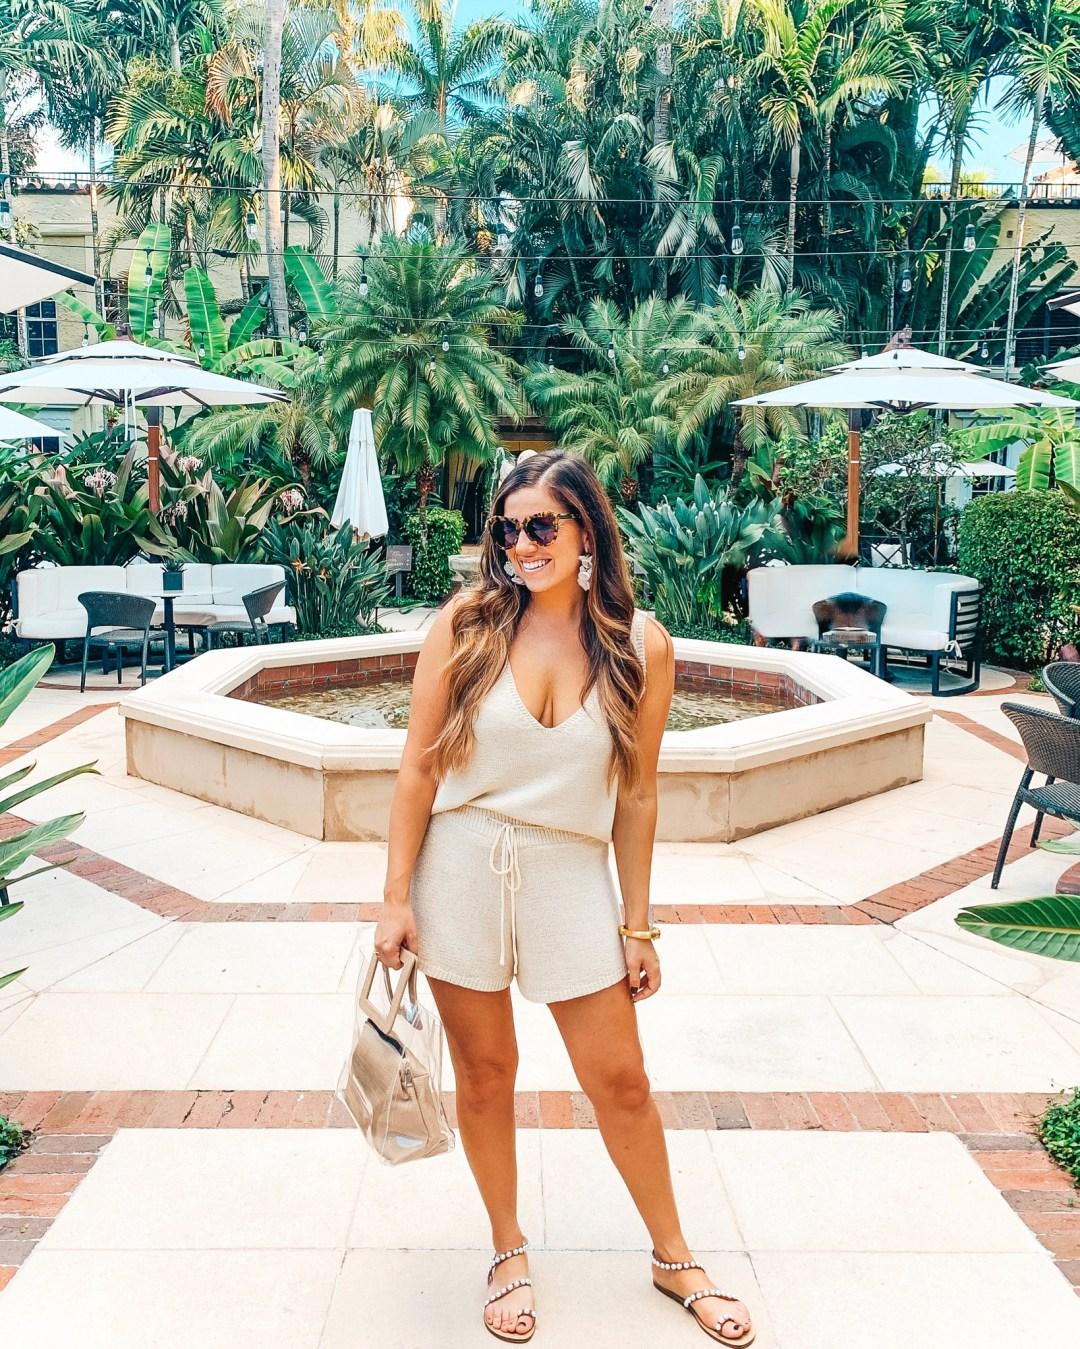 Brazilian Court Hotel Palm Beach review by Jaime Cittadino